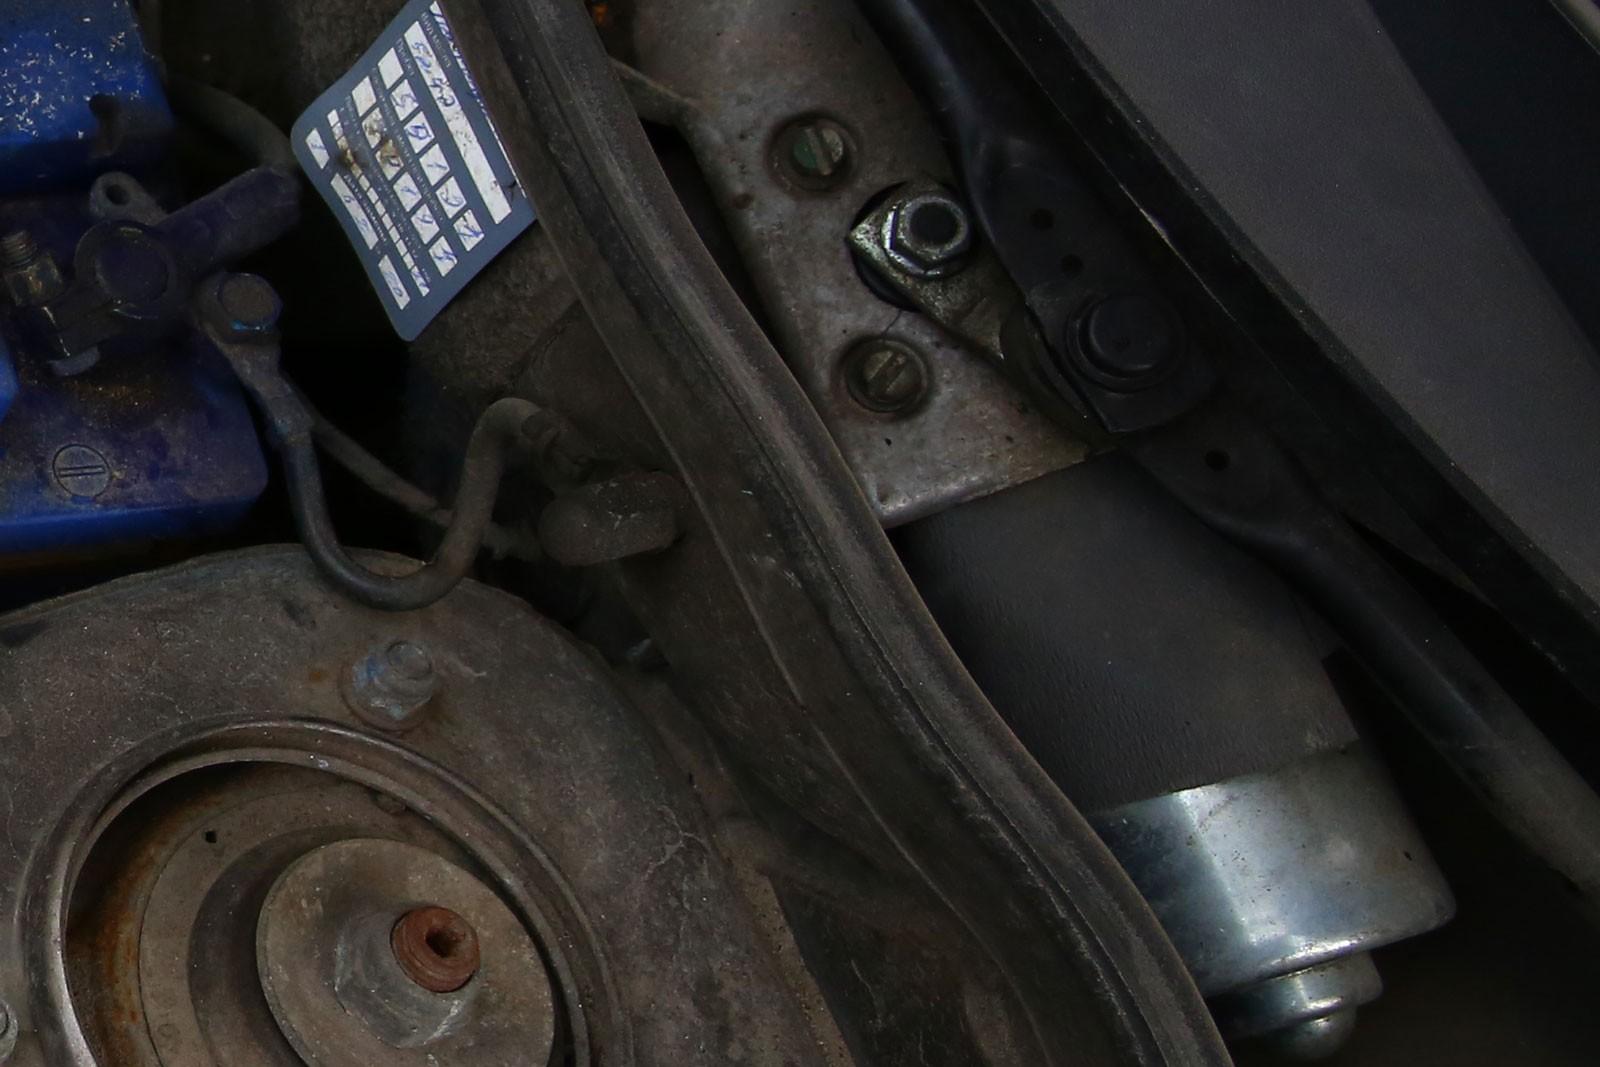 Lada Granta c пробегом: гниёт как Logan, а блок комфорта хуже, чем у Peugeot, зато дешевле